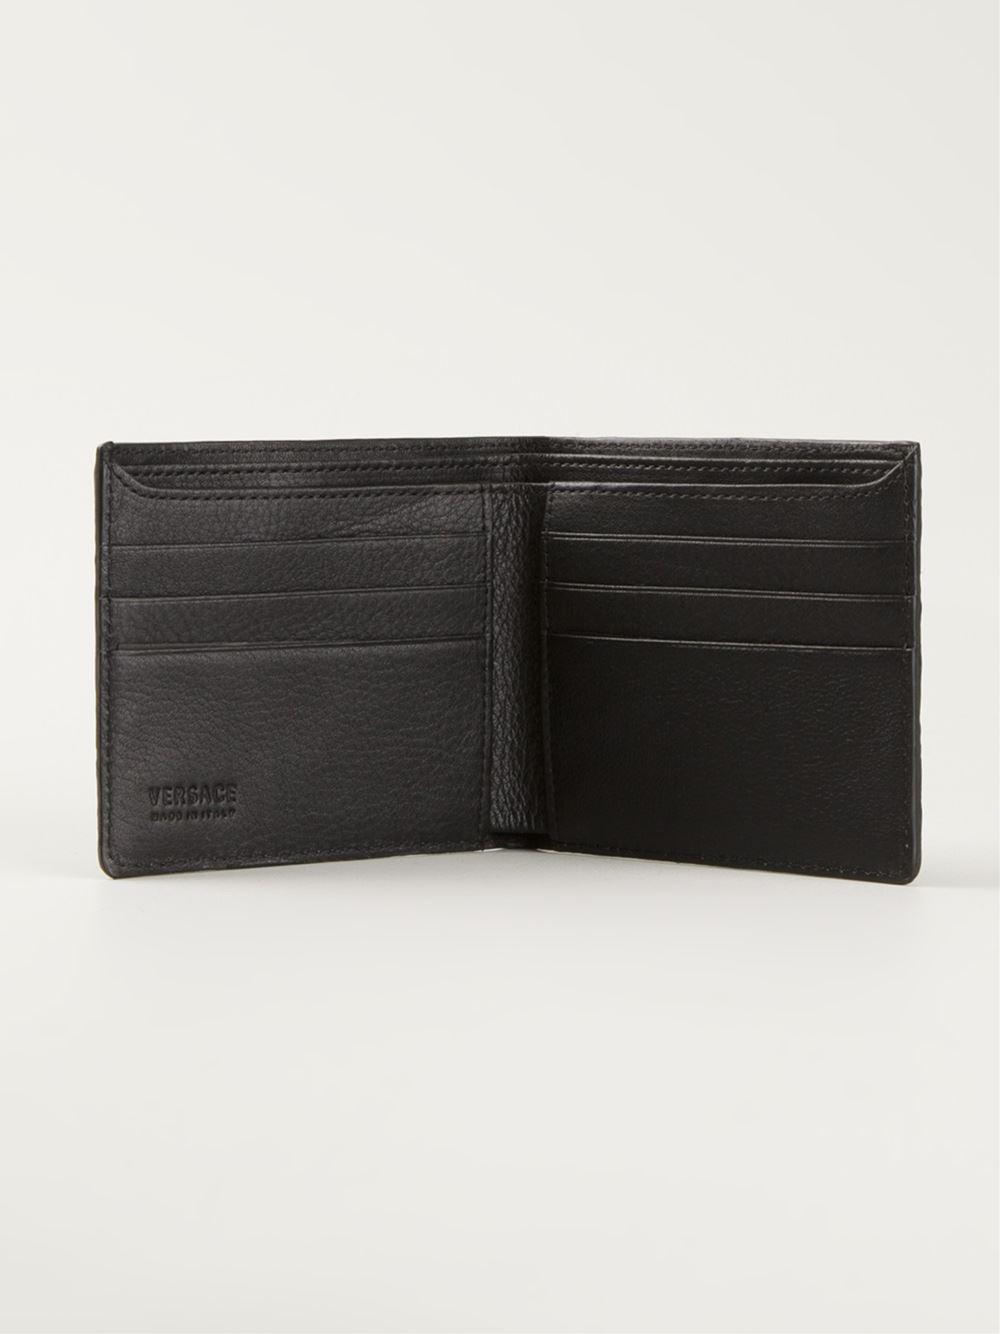 Versace Embossed Wallet In Black For Men Lyst